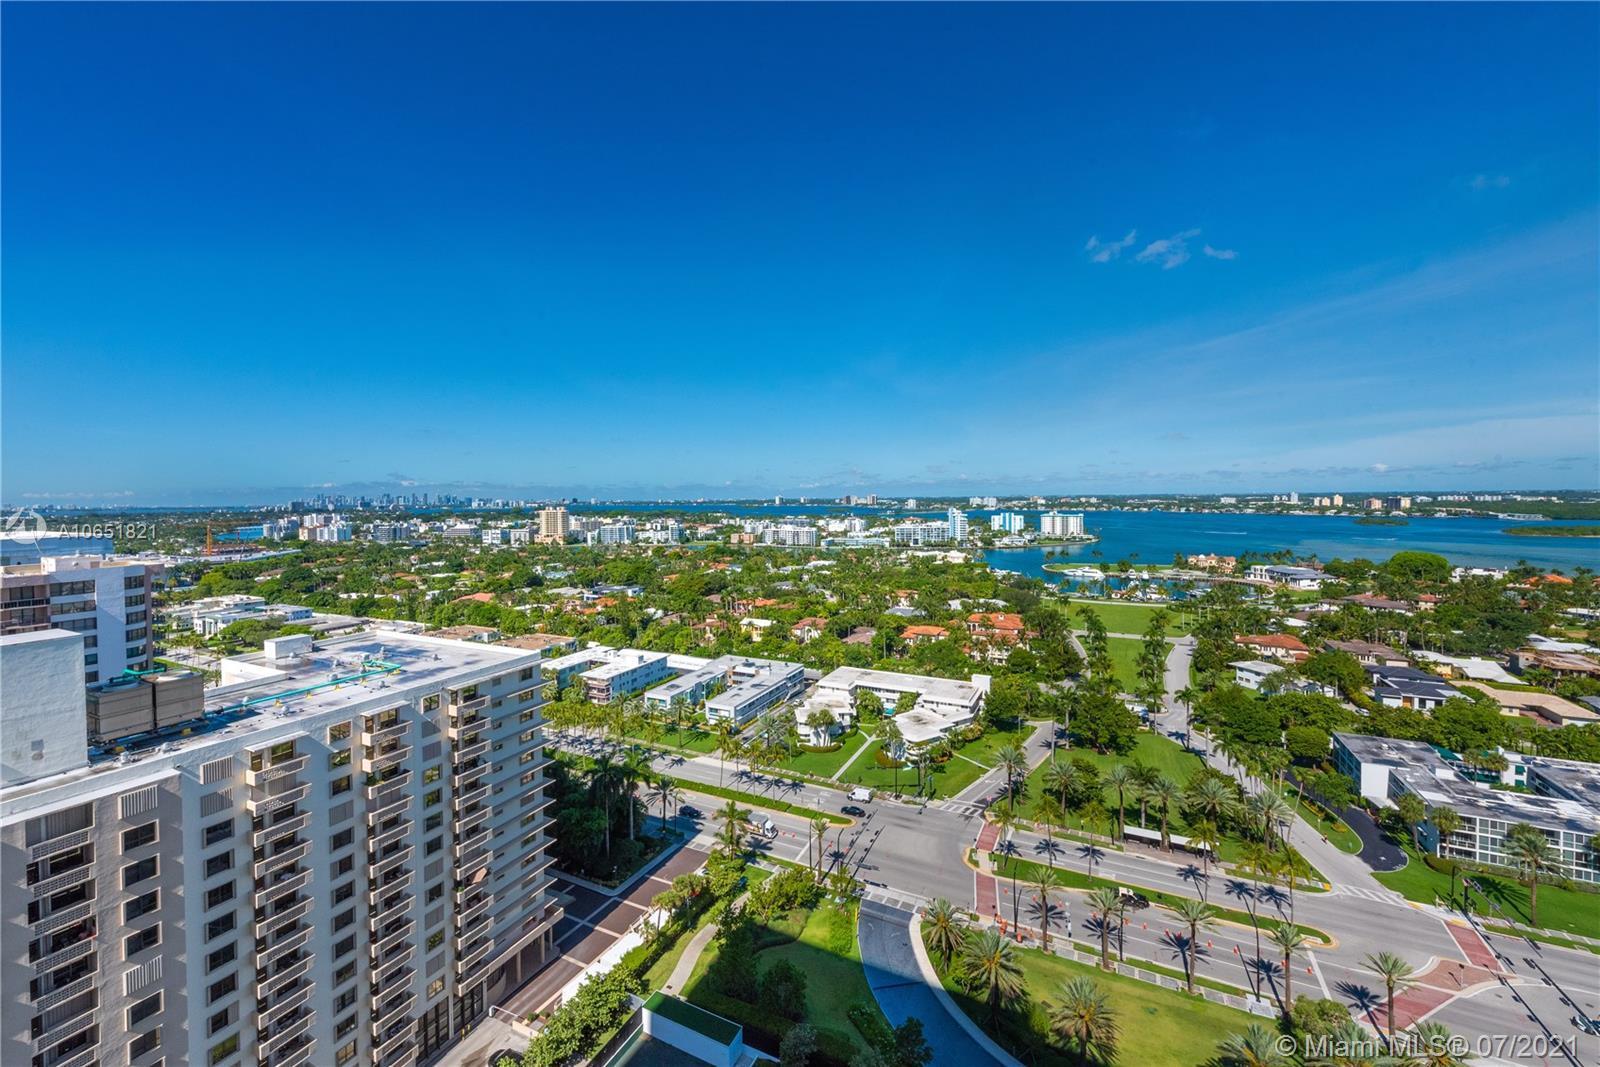 Oceana A new spectacular condominium paradise with amazing views to the bay, marina & sunset. 2 beds